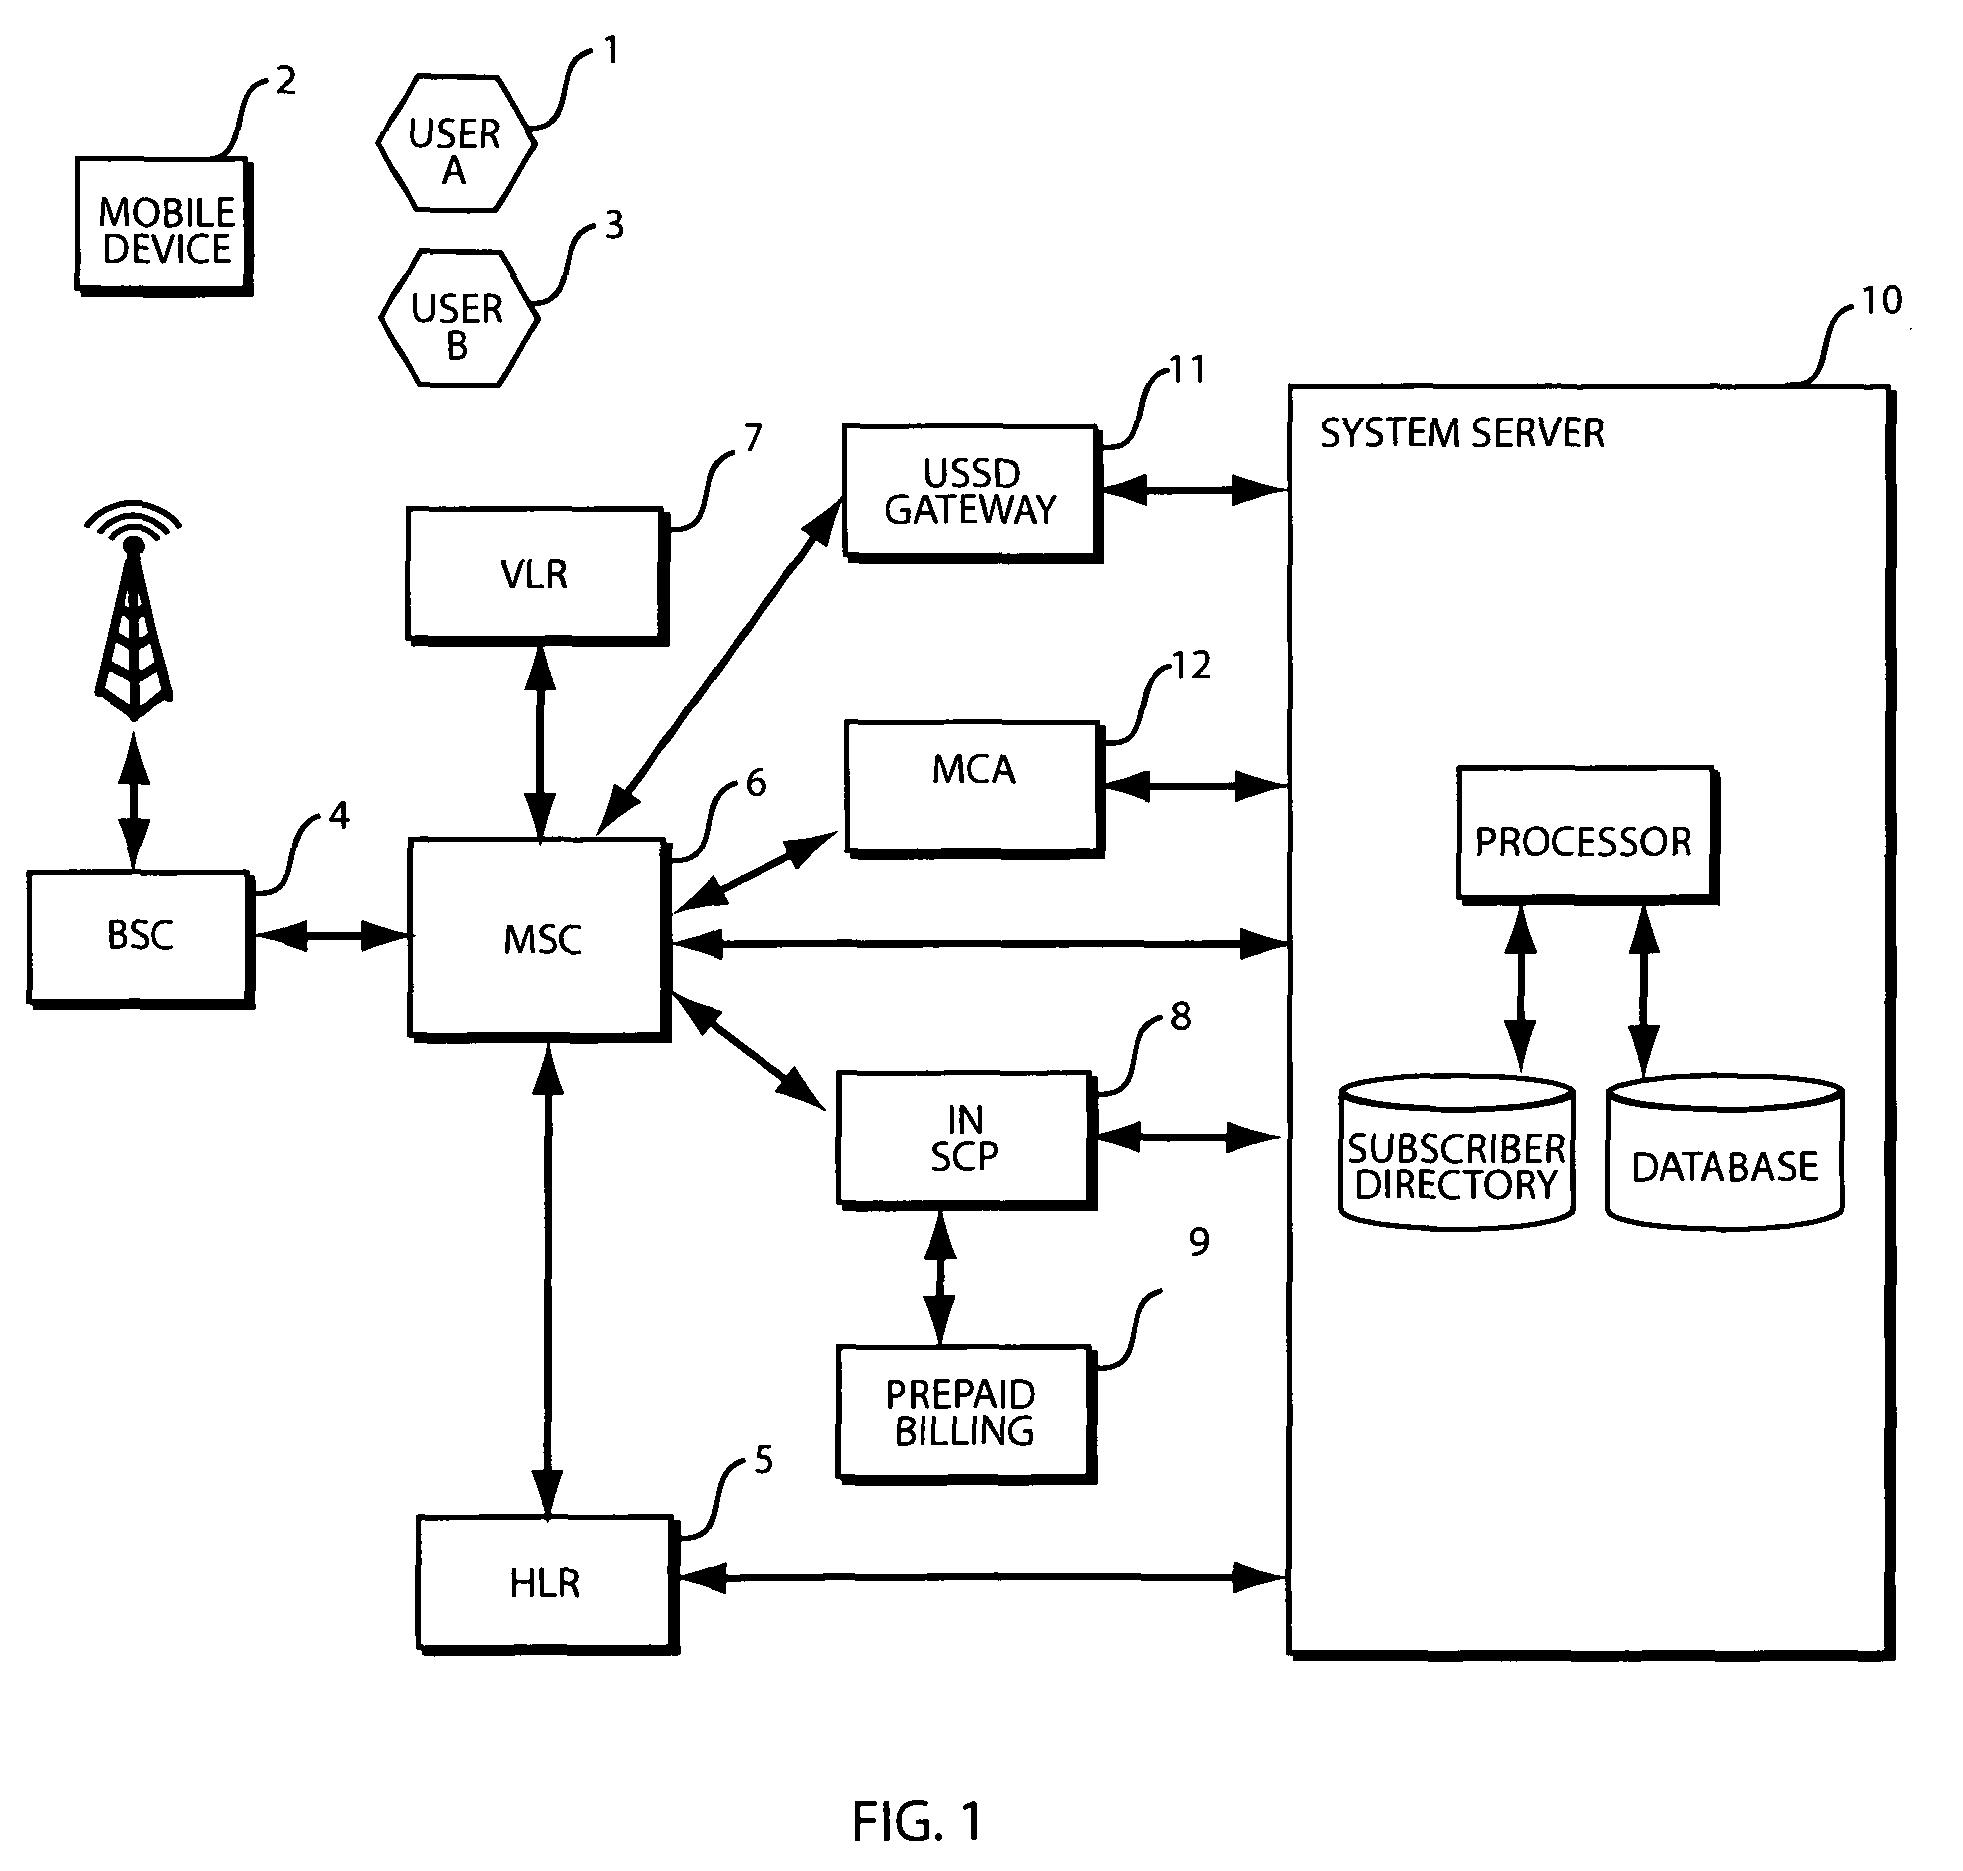 circuit diagram mobile phone wiring diagram database  brevet us8311532 method and system for enabling personalized mobile network diagram circuit diagram mobile phone